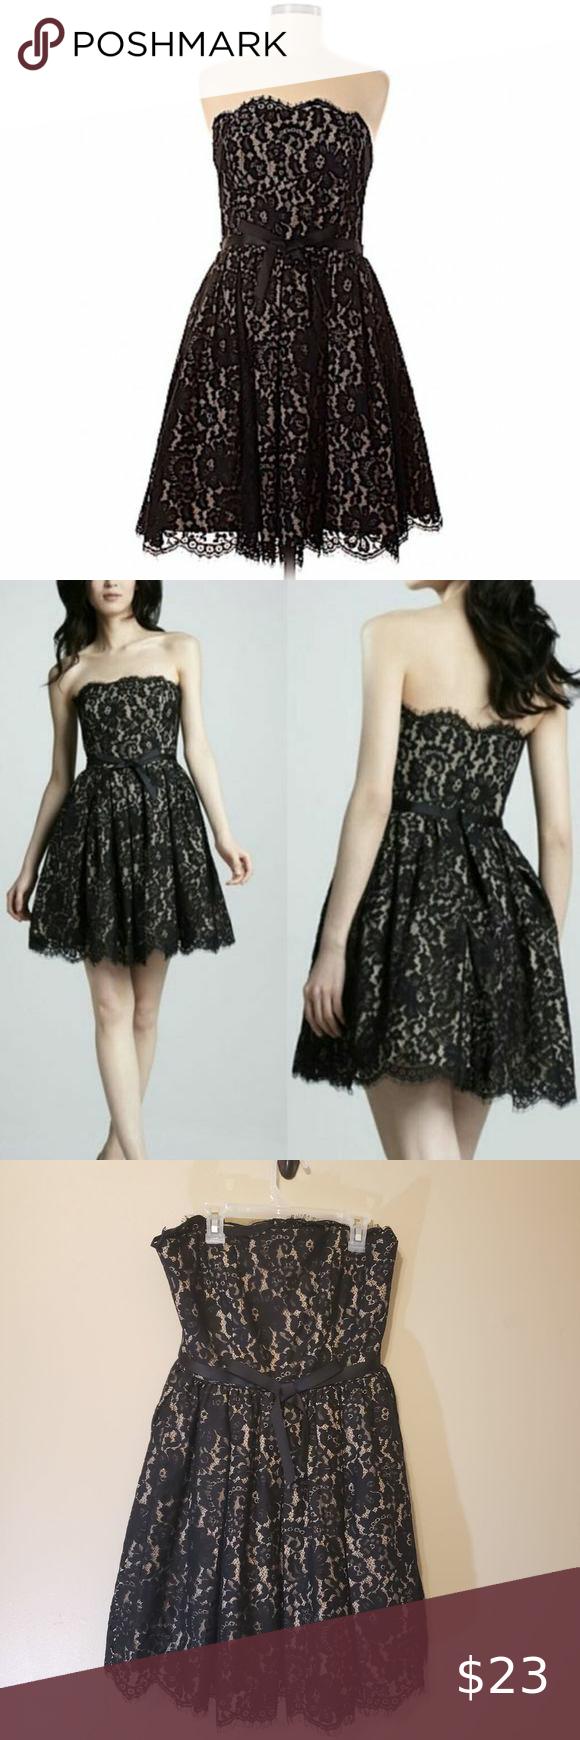 Nieman Marcus Black Lace Party Dress Semi Formal Black Lace Party Dress Lace Party Dresses Semi Formal Dresses [ 1740 x 580 Pixel ]